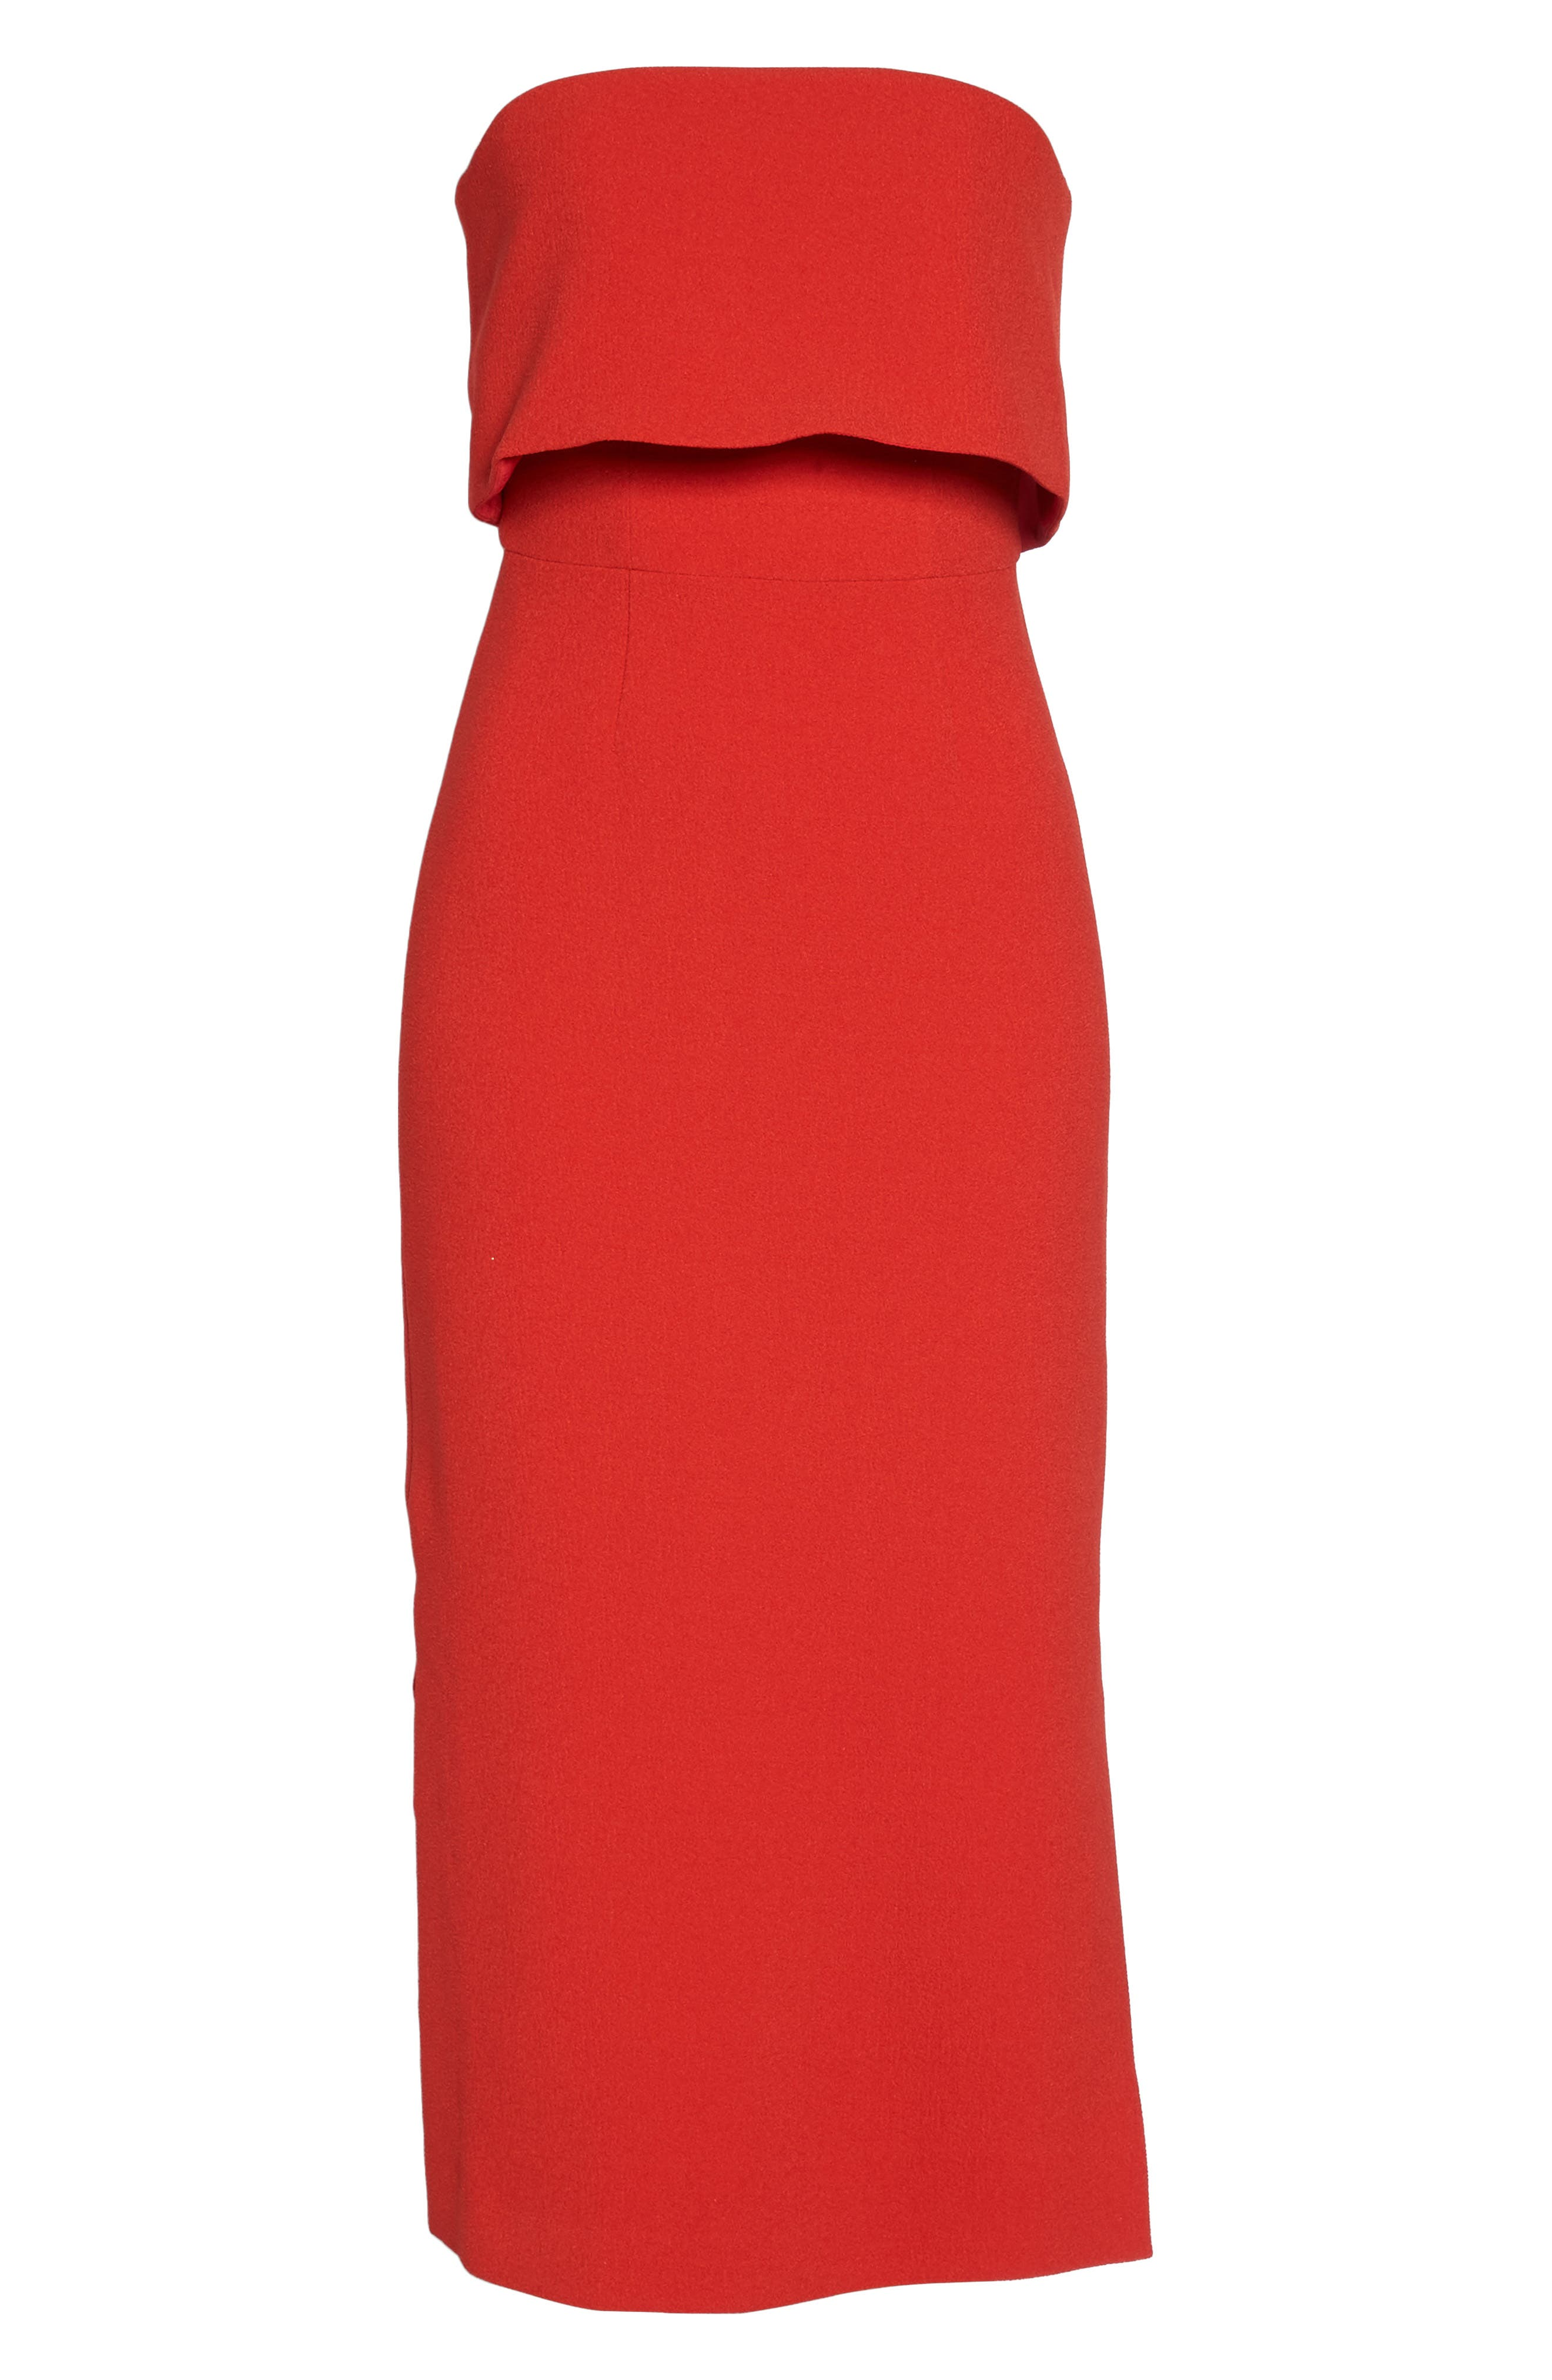 Entice Strapless Midi Dress,                             Alternate thumbnail 6, color,